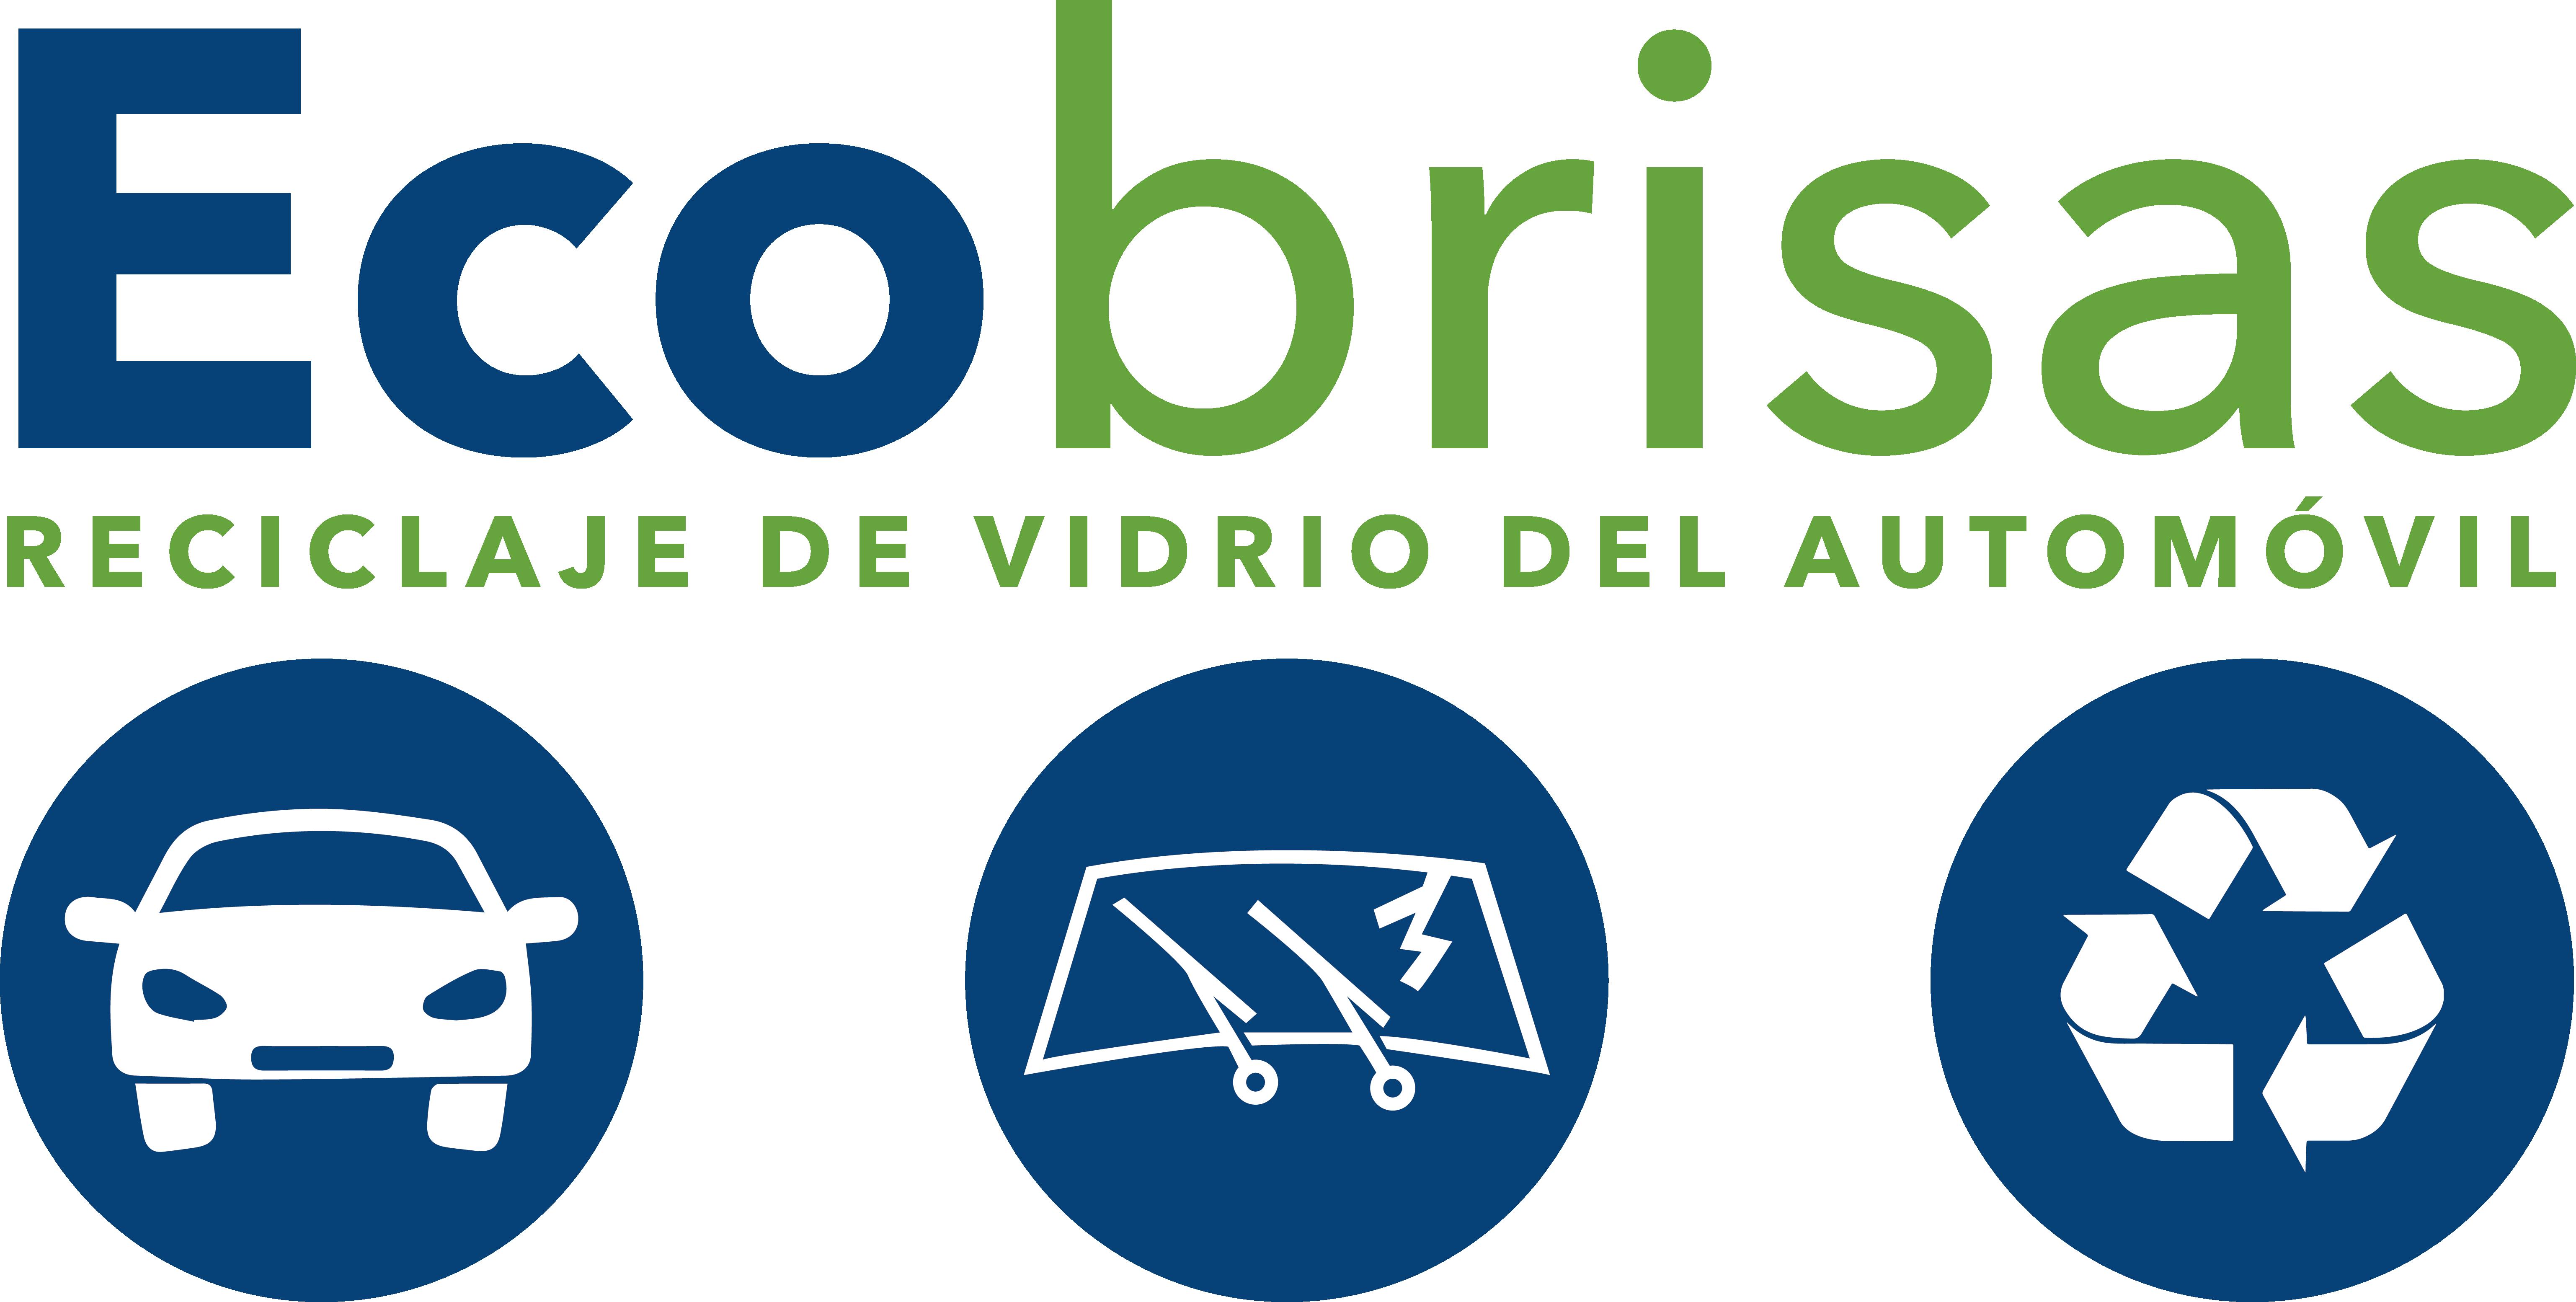 Ecobrisas empresa asociada AJE Las Palmas